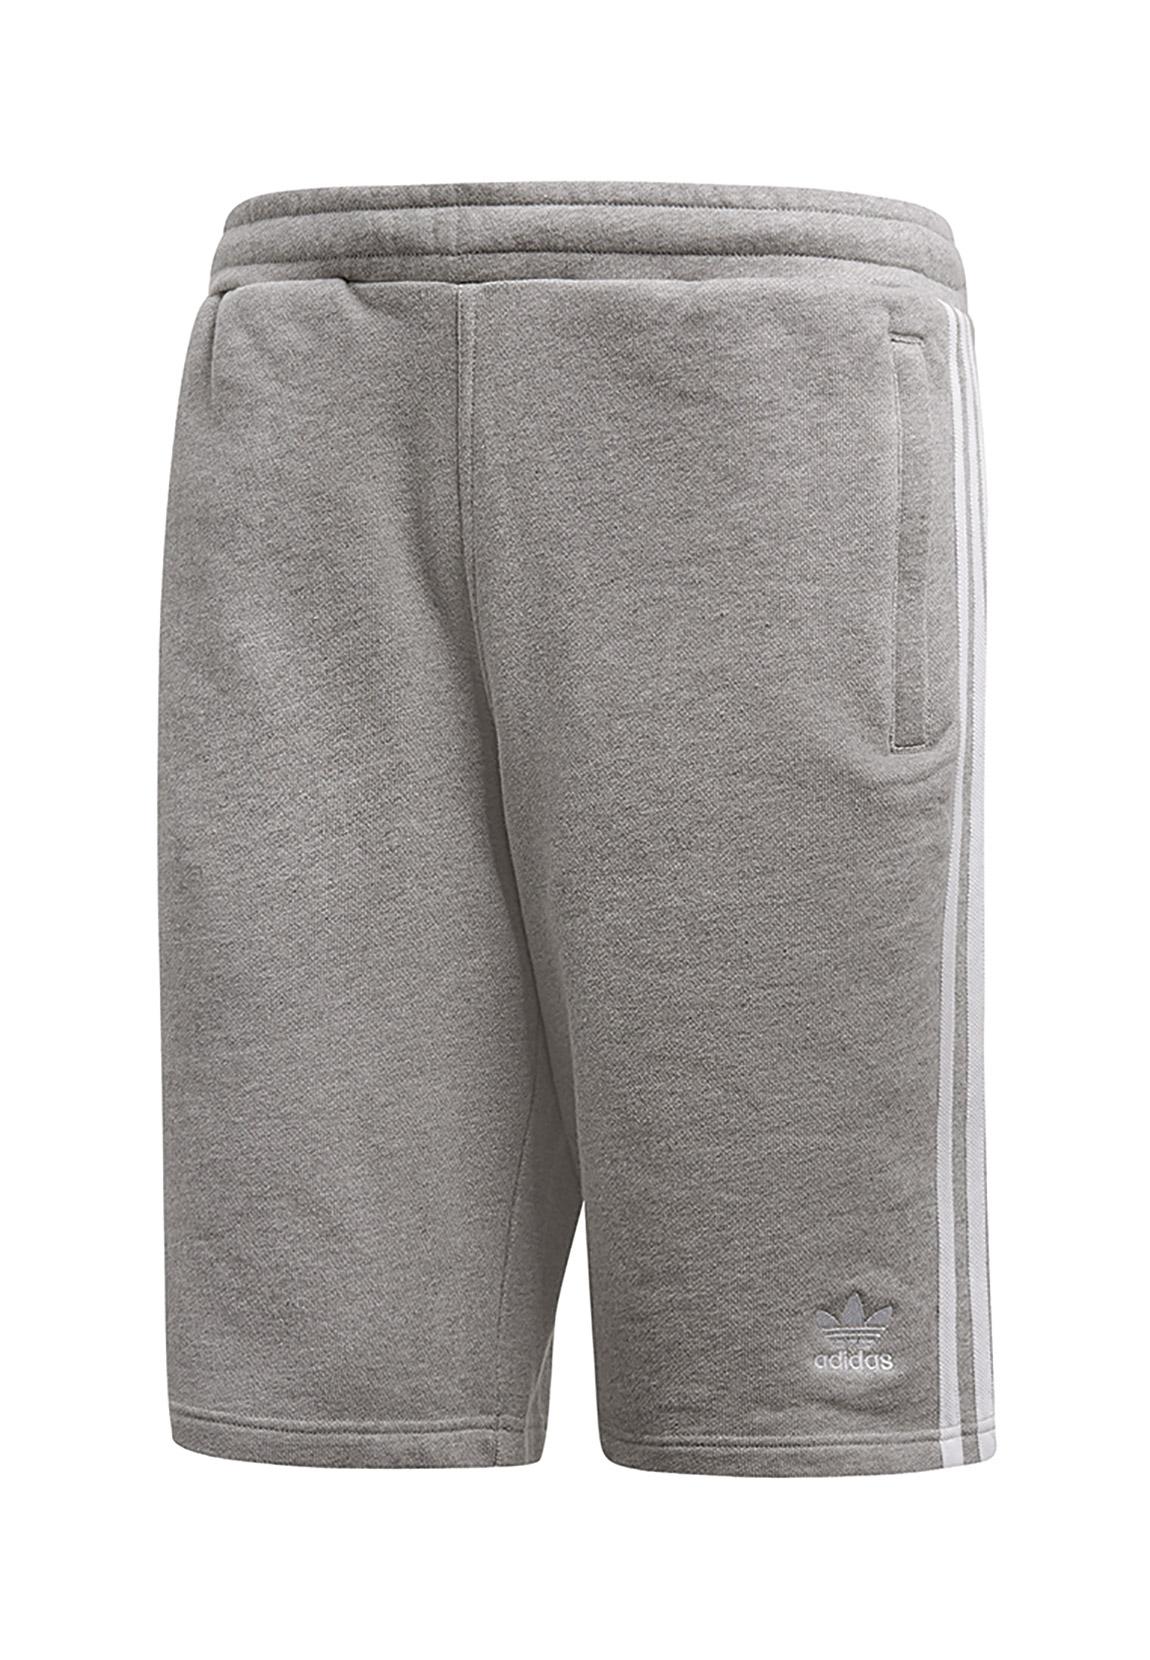 Details about Adidas Originals Men's Shorts 3 Stripe Shorts DH5803 Grey